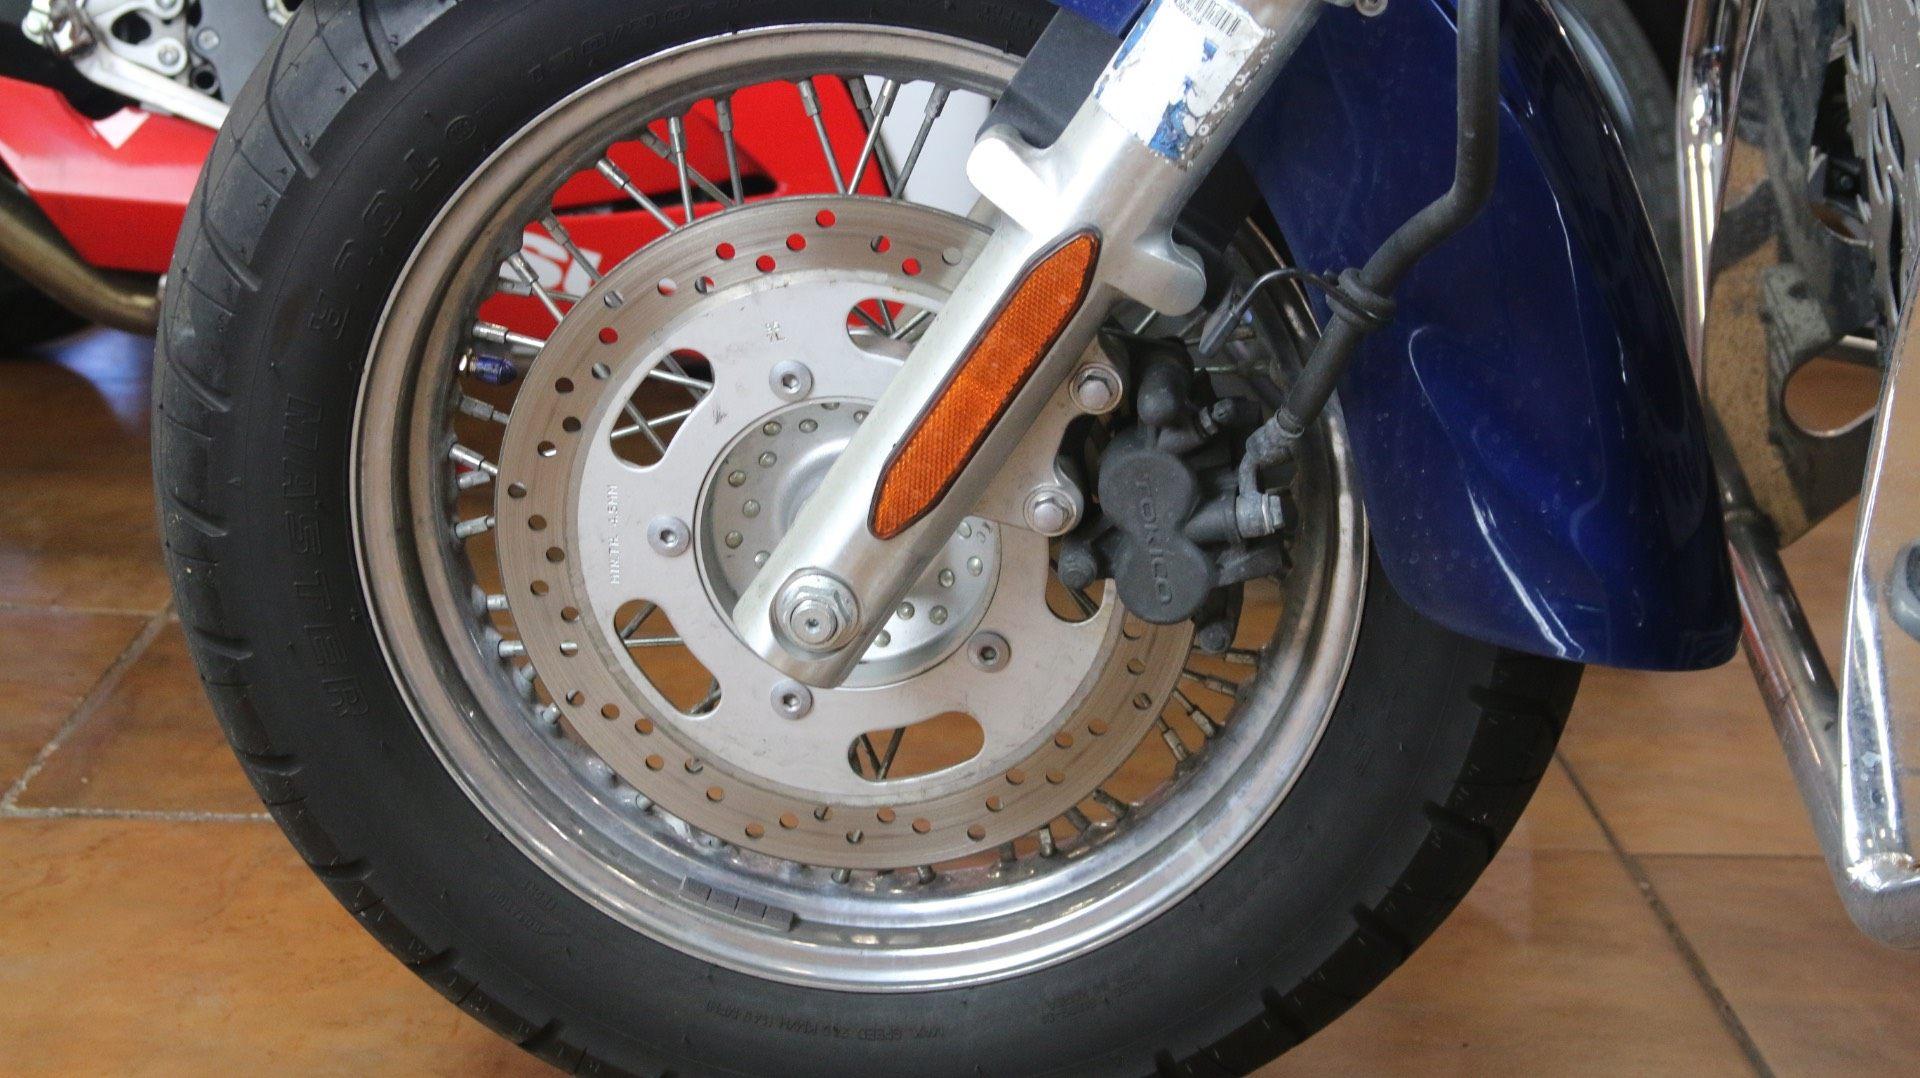 2008 Kawasaki Vulcan® 900 Classic in Pinellas Park, Florida